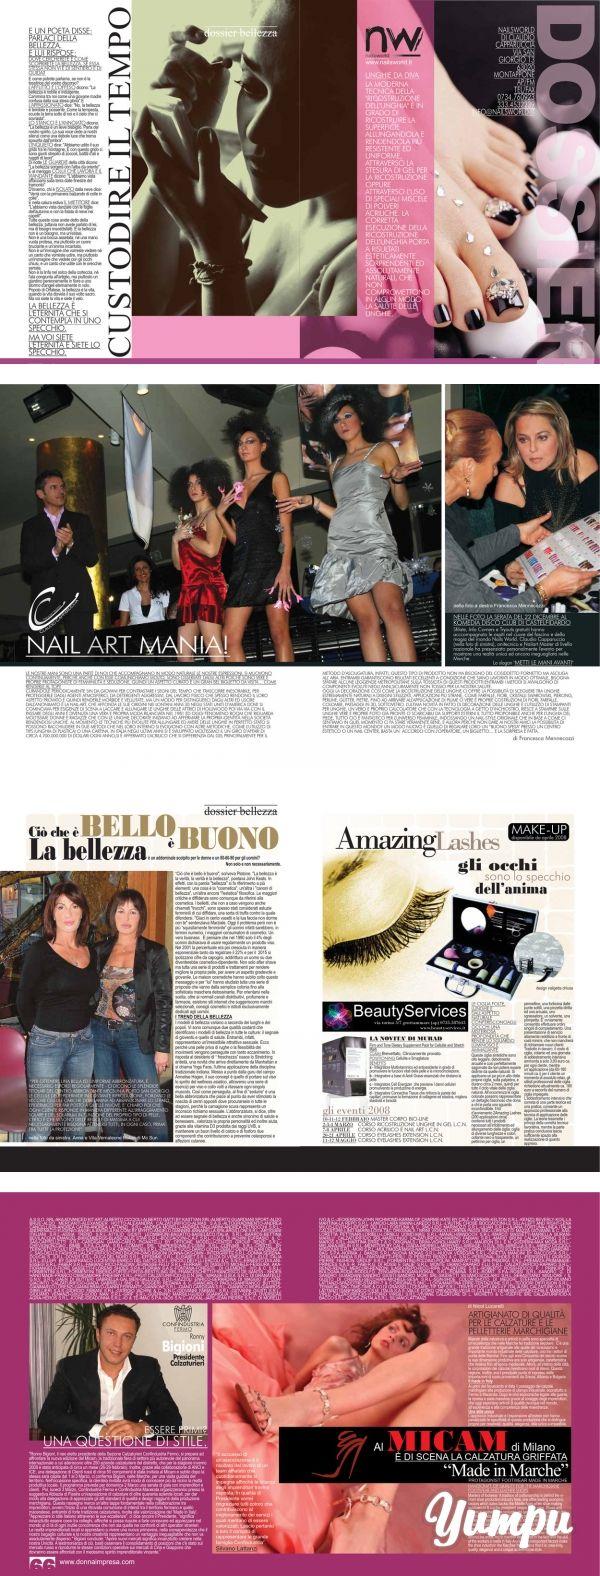 CUST ODIRE IL TEMPO - Donna Impresa Magazine - Magazine with 5 pages: CUST ODIRE IL TEMPO - Donna Impresa Magazine